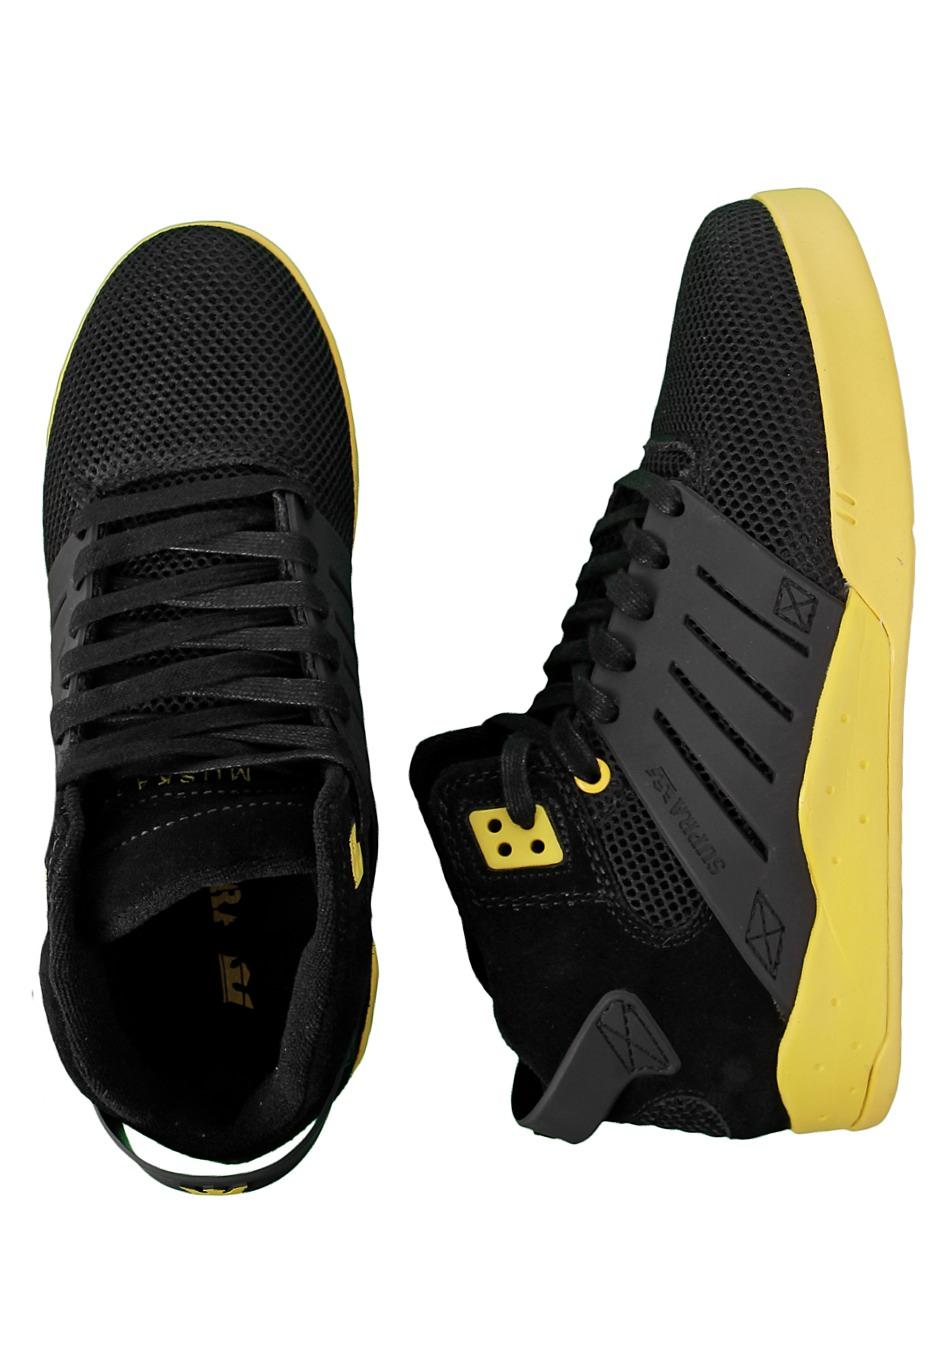 Supra - Skytop III Mid Black Mesh/Neon Yellow - Shoes ...